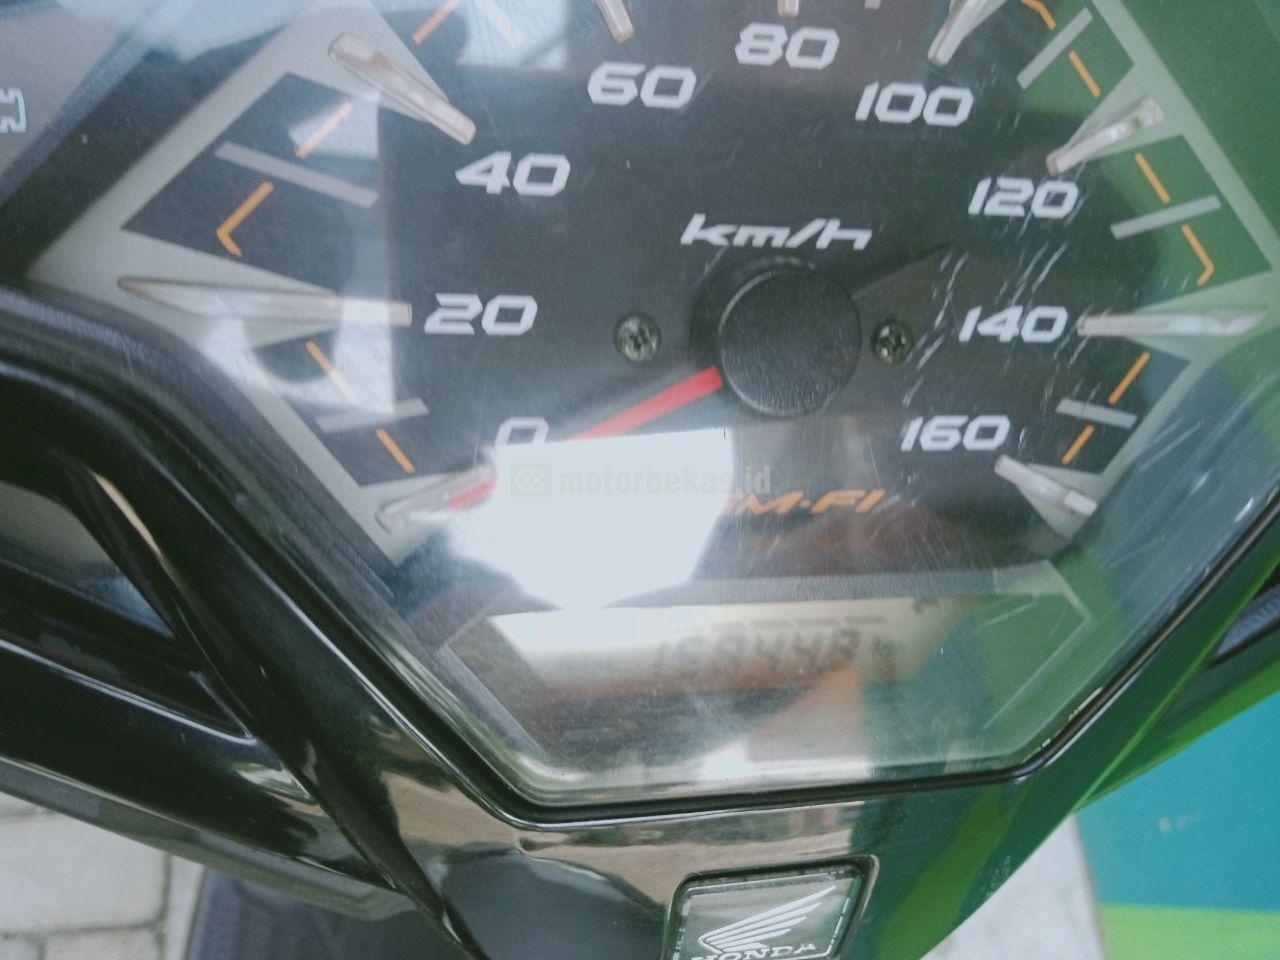 HONDA VARIO 125 FI 4122 motorbekas.id